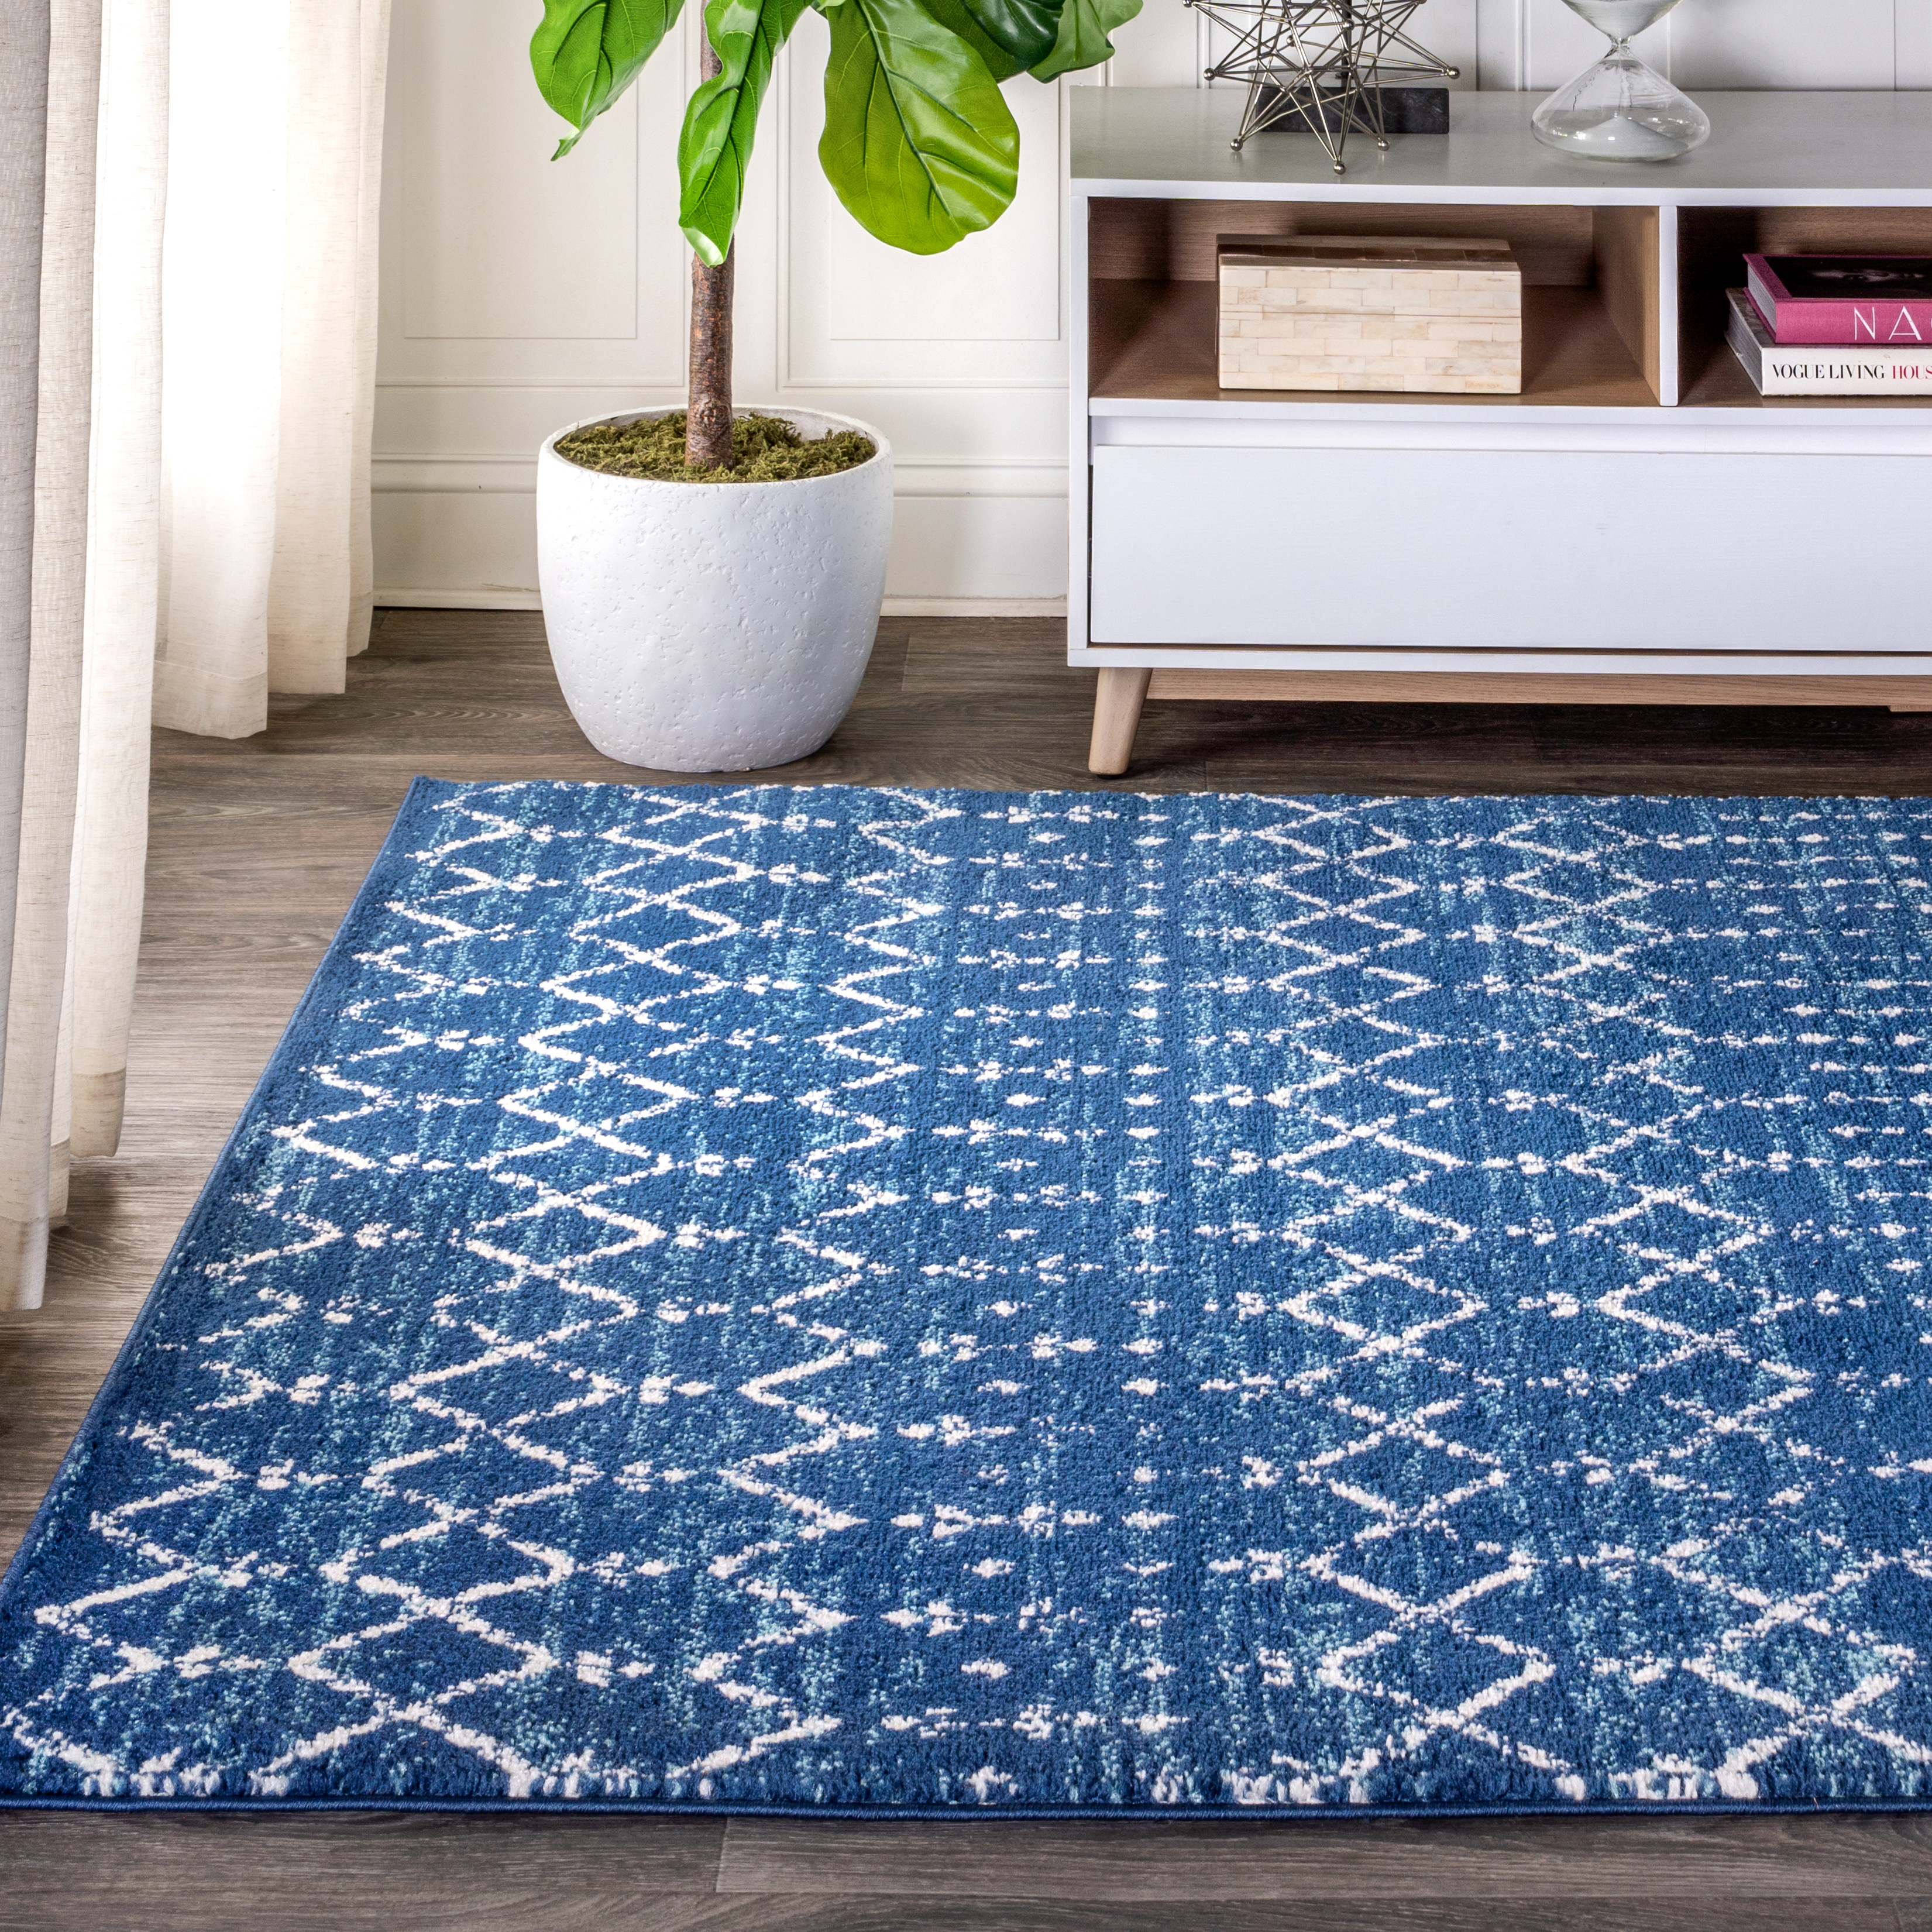 Moroccan HYPE Boho Vintage Diamond Blue/White 8 ft. x 10 ft. Area Rug